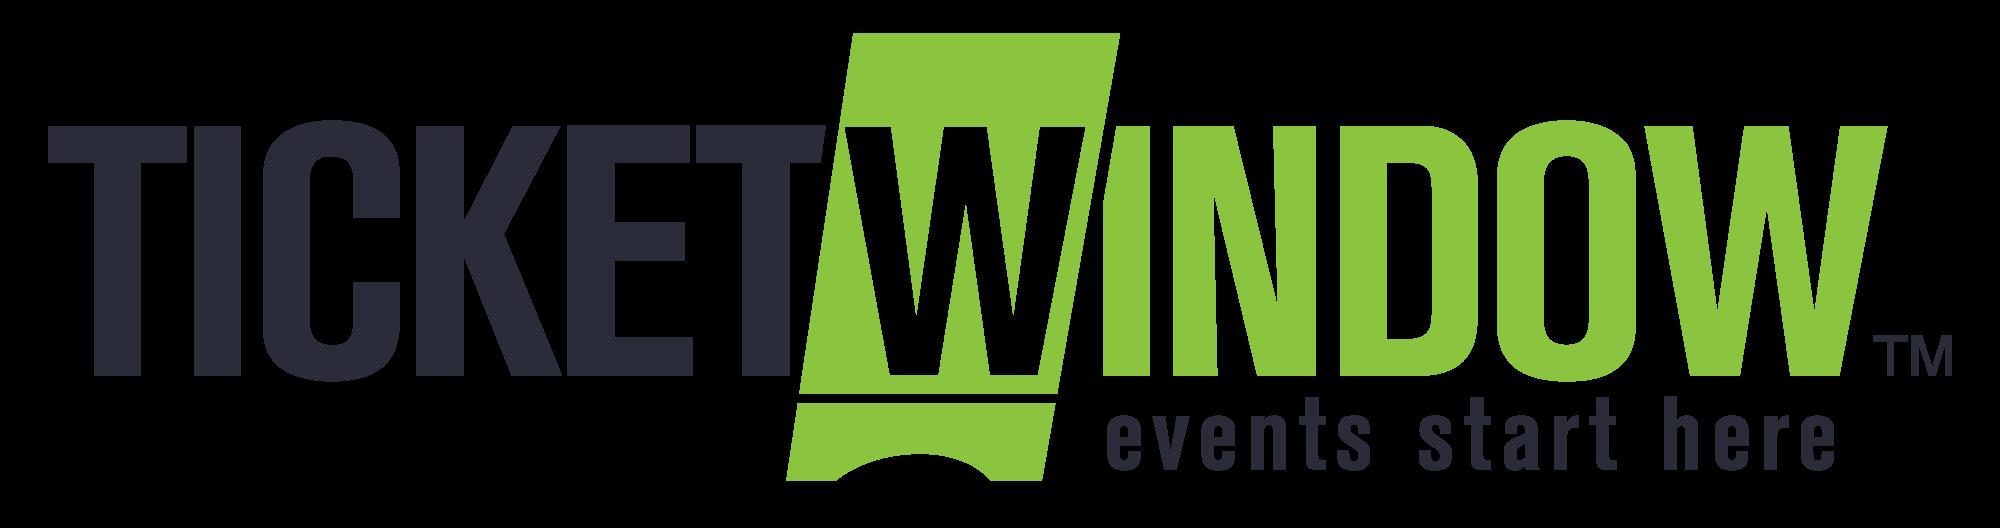 ticket window logo